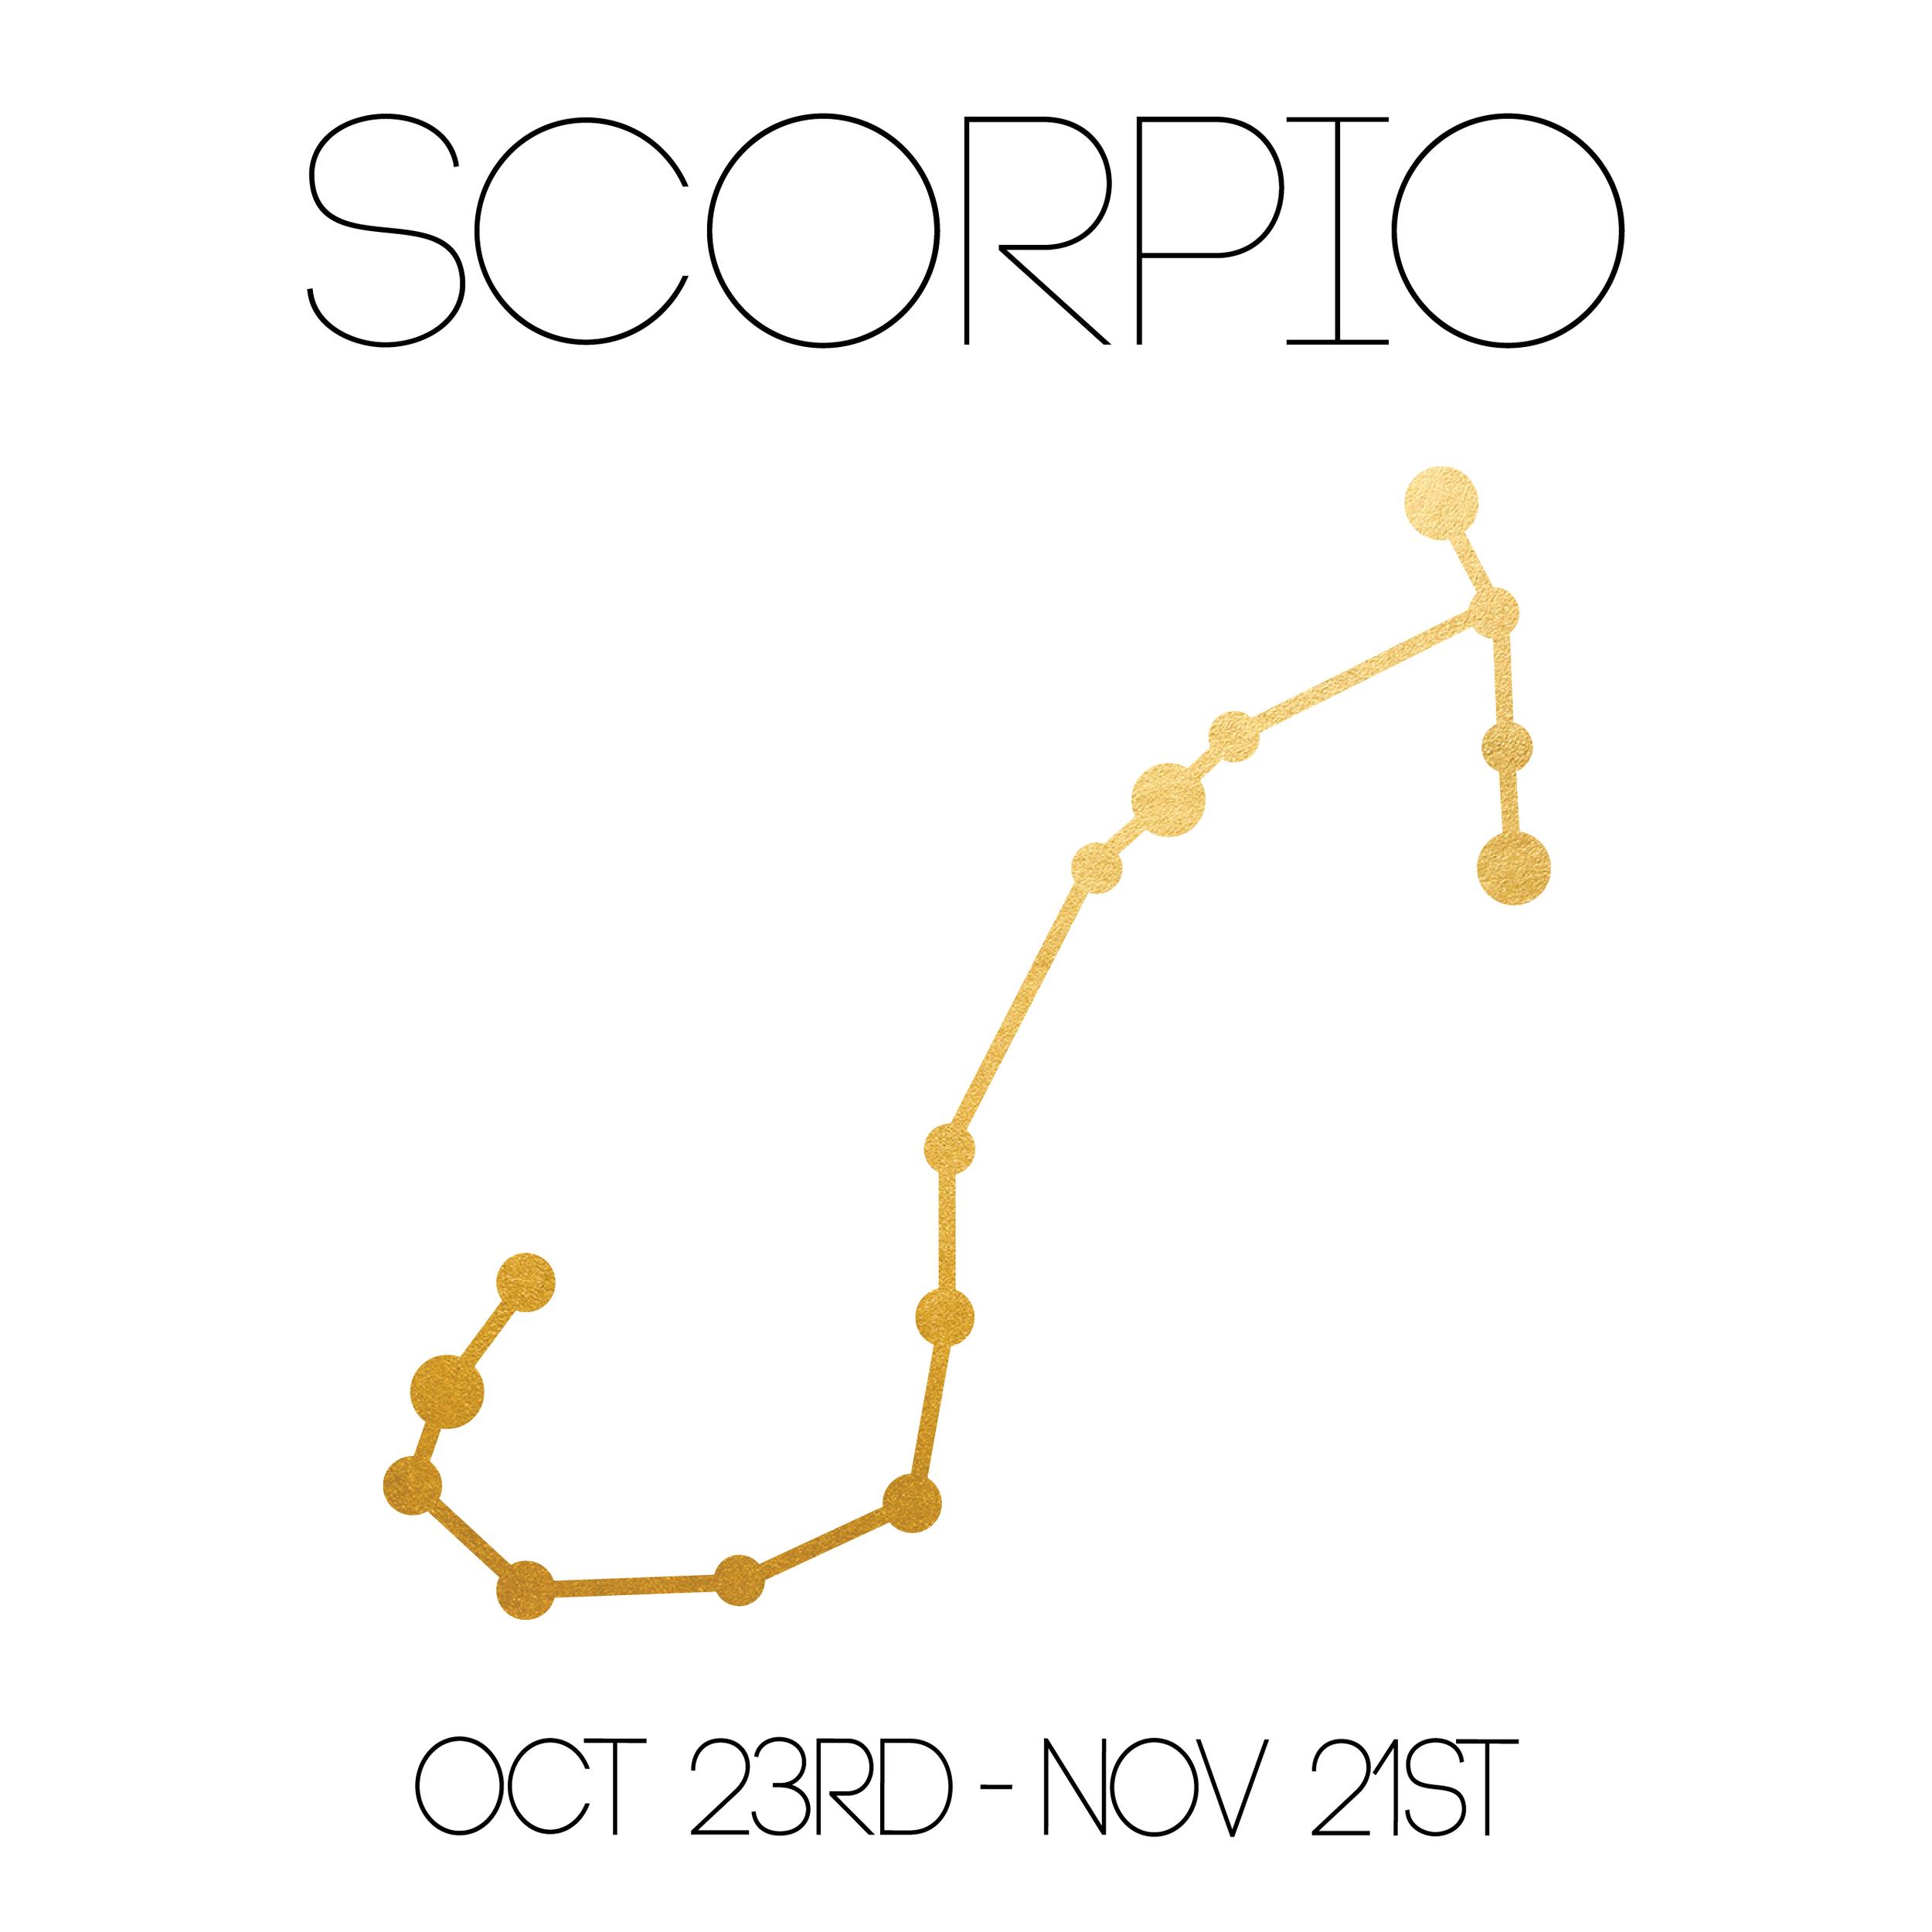 Scorpio_About_Website-01.jpg